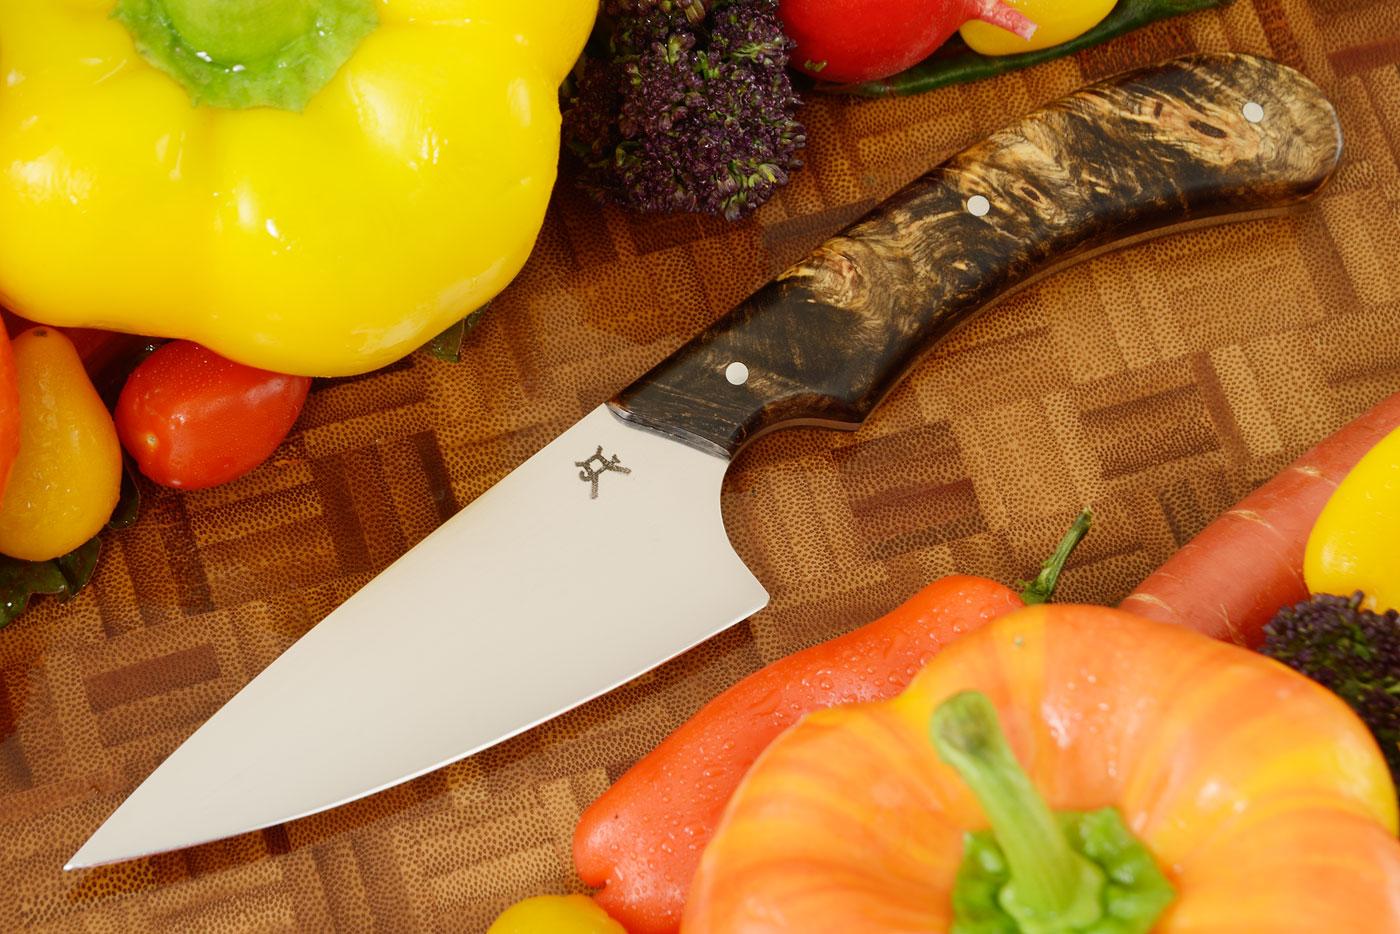 Chef's Knife (4-1/4 in) with Buckeye Burl